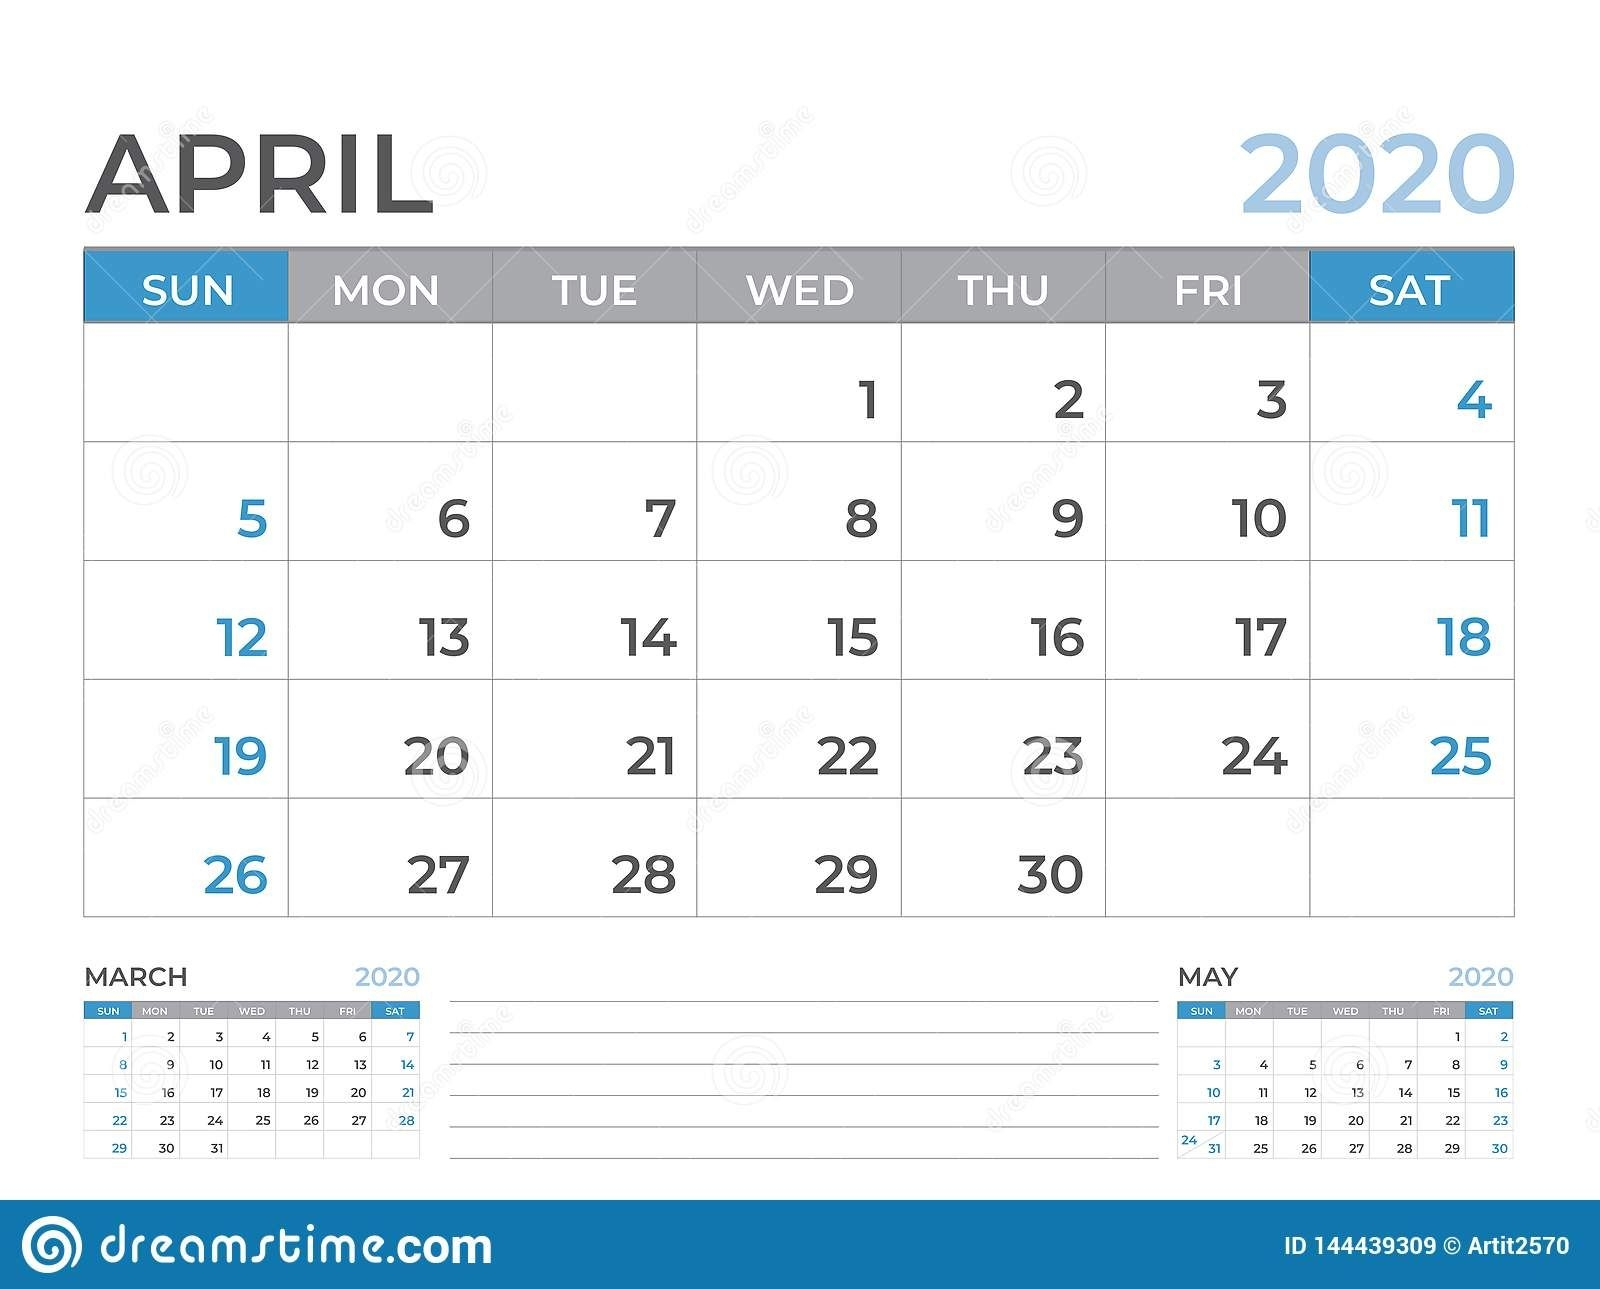 April 2020 Calendar Template, Desk Calendar Layout Size 8 X